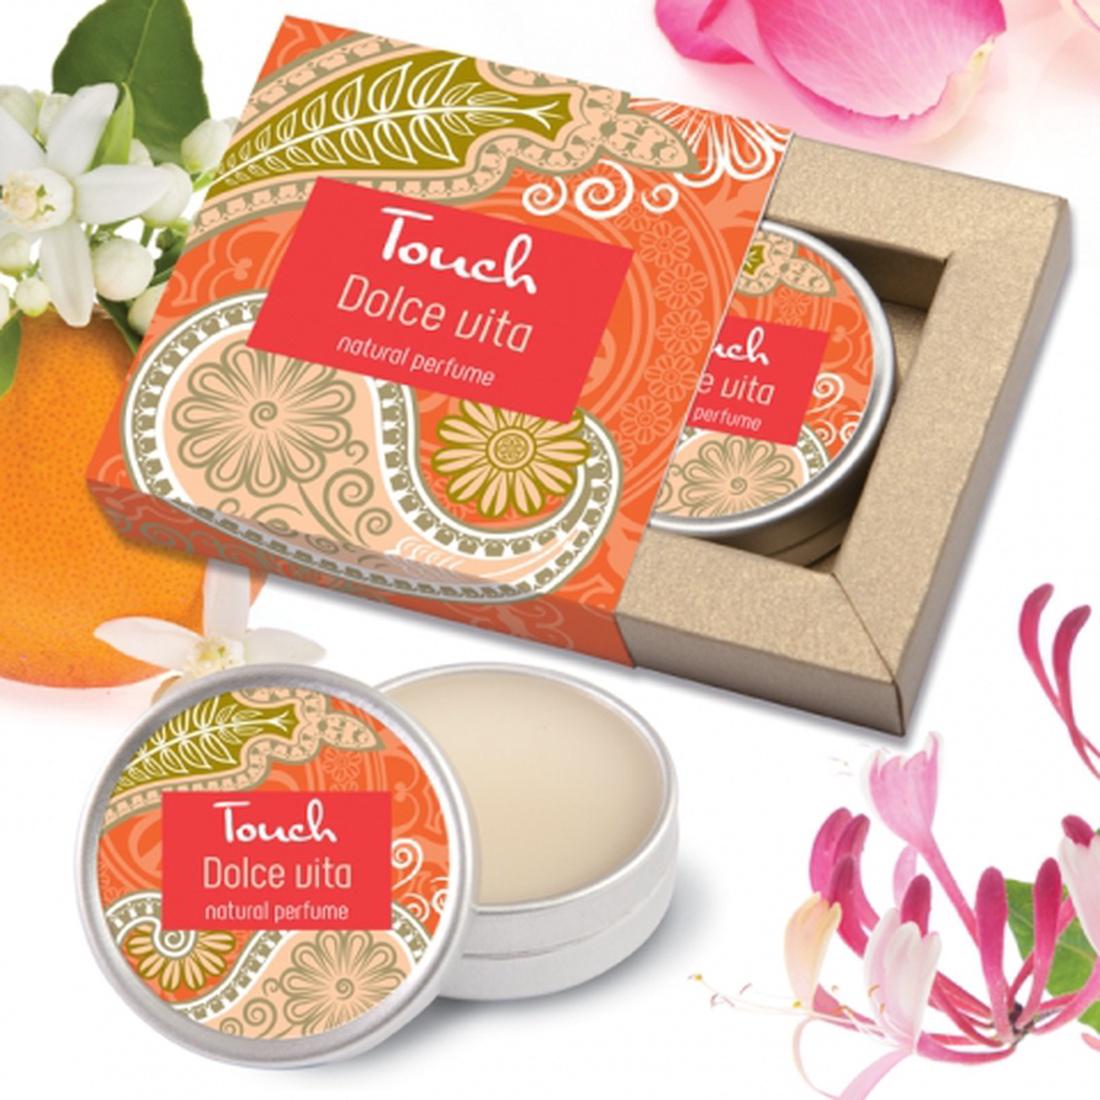 DOLCE VITA natúr parfüm (touchparfum) - Meska.hu